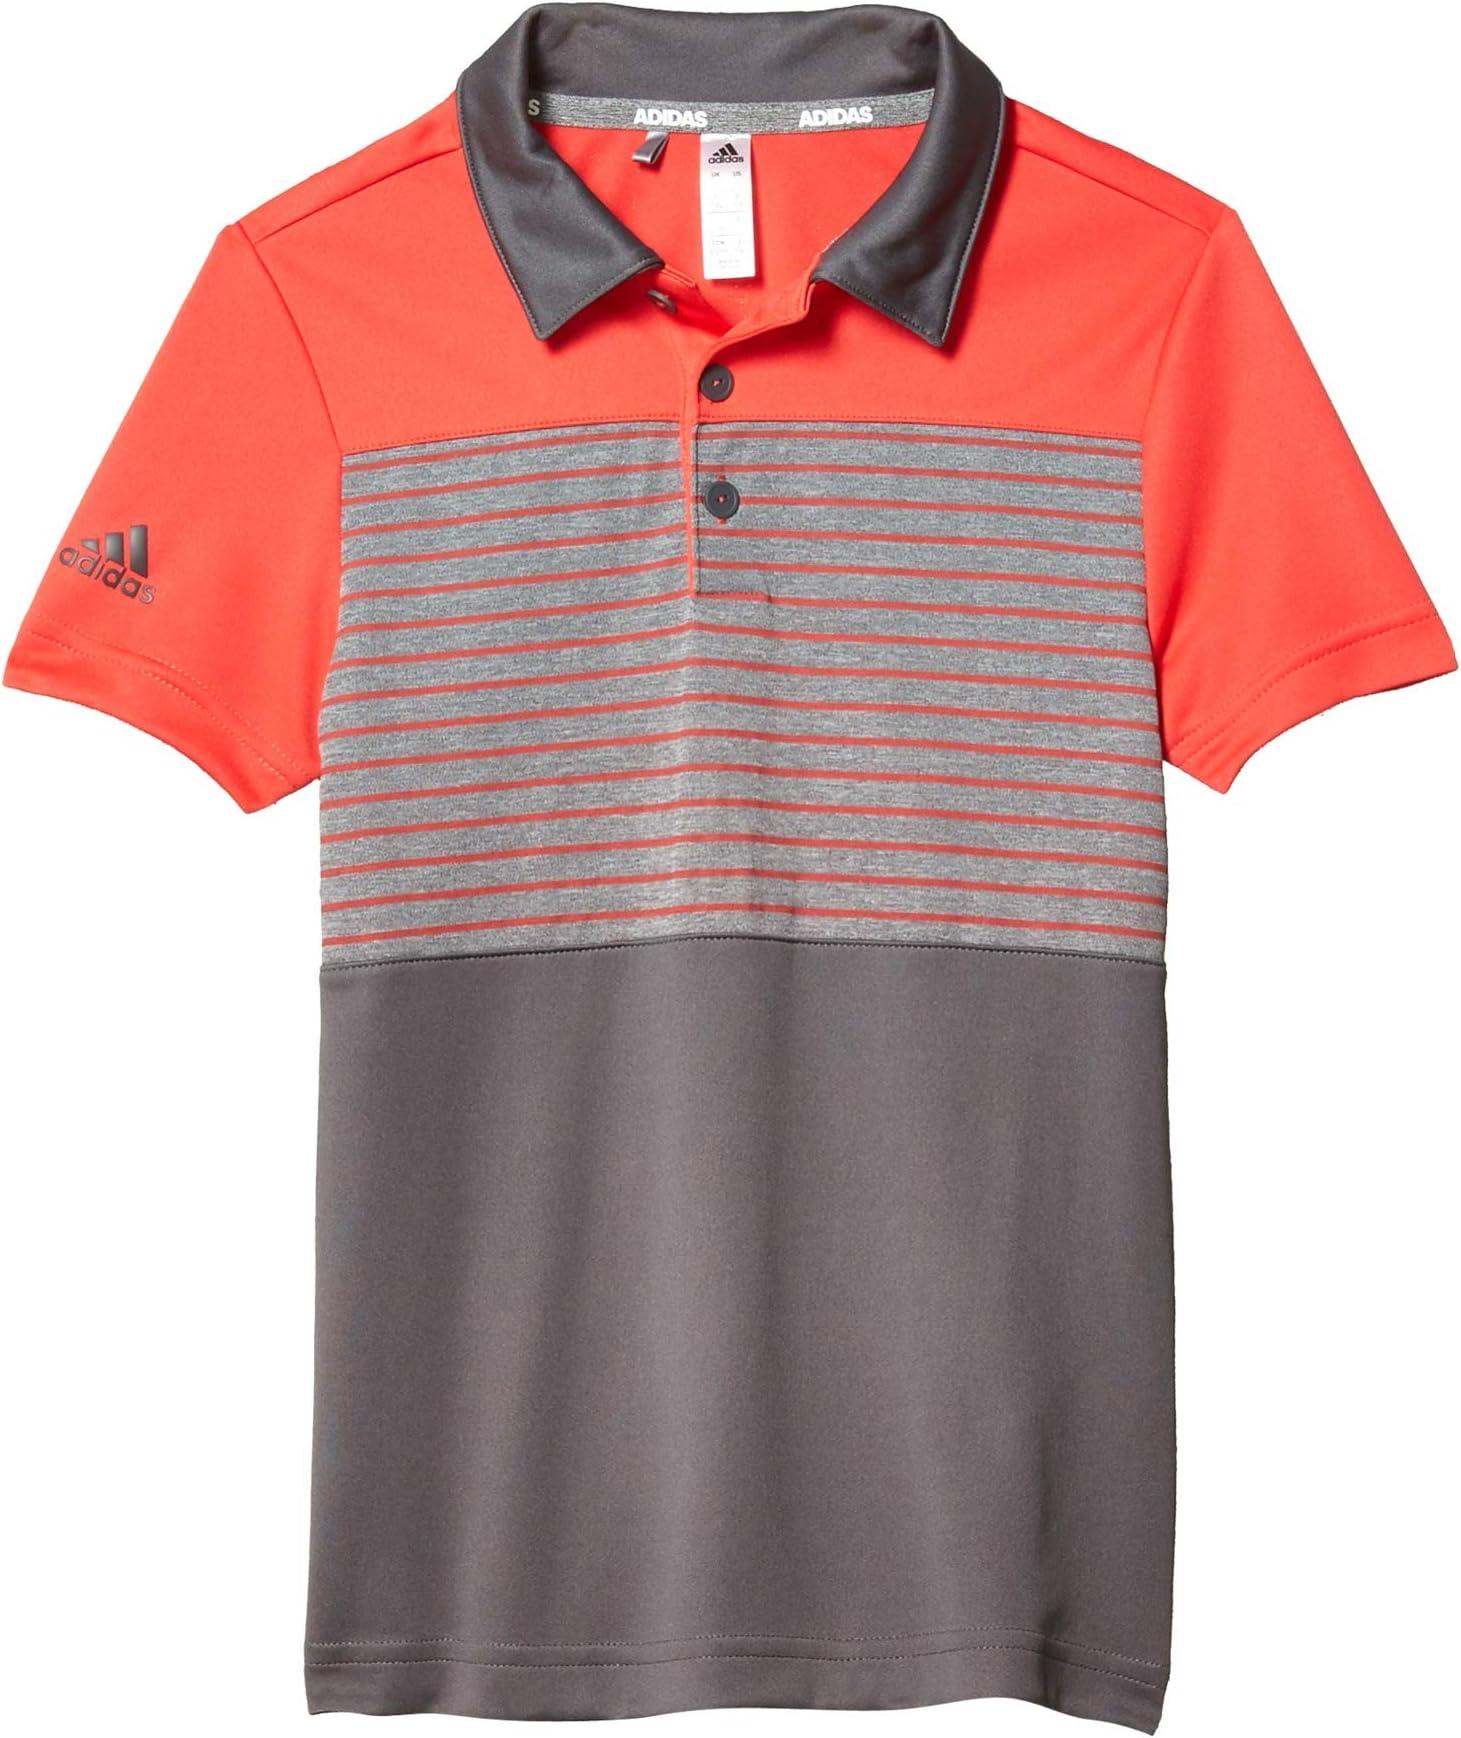 adidas Golf Kids Engineered Stripe Polo Shirt